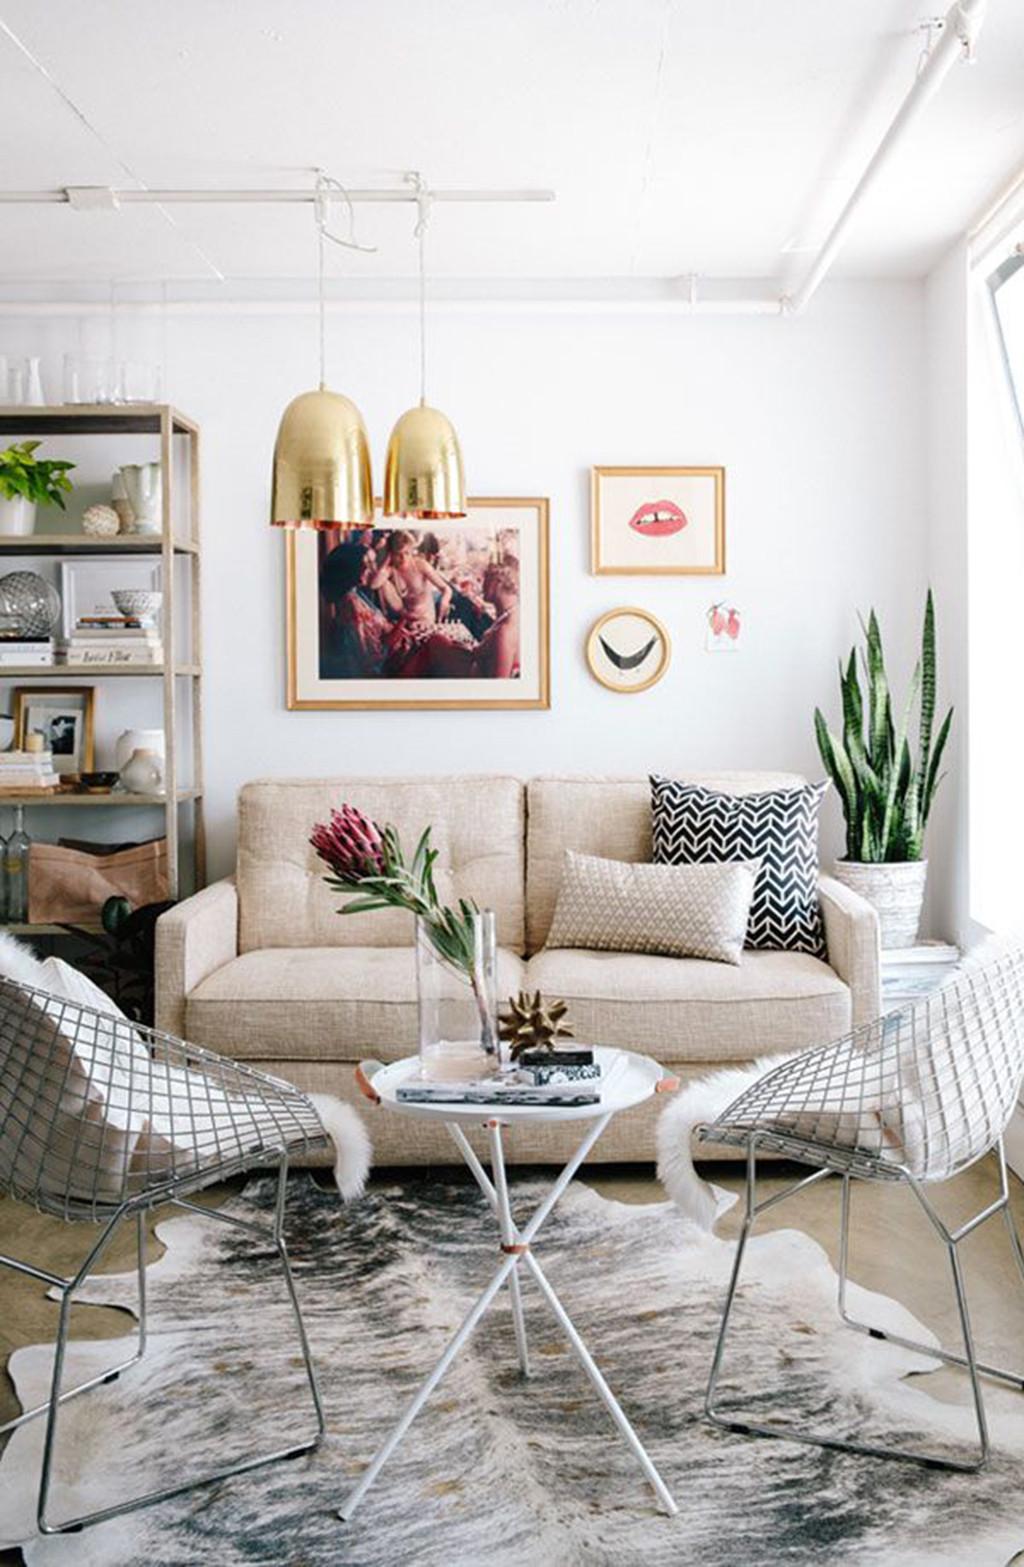 50 Small Living Room Ideas thewowdecor (42)